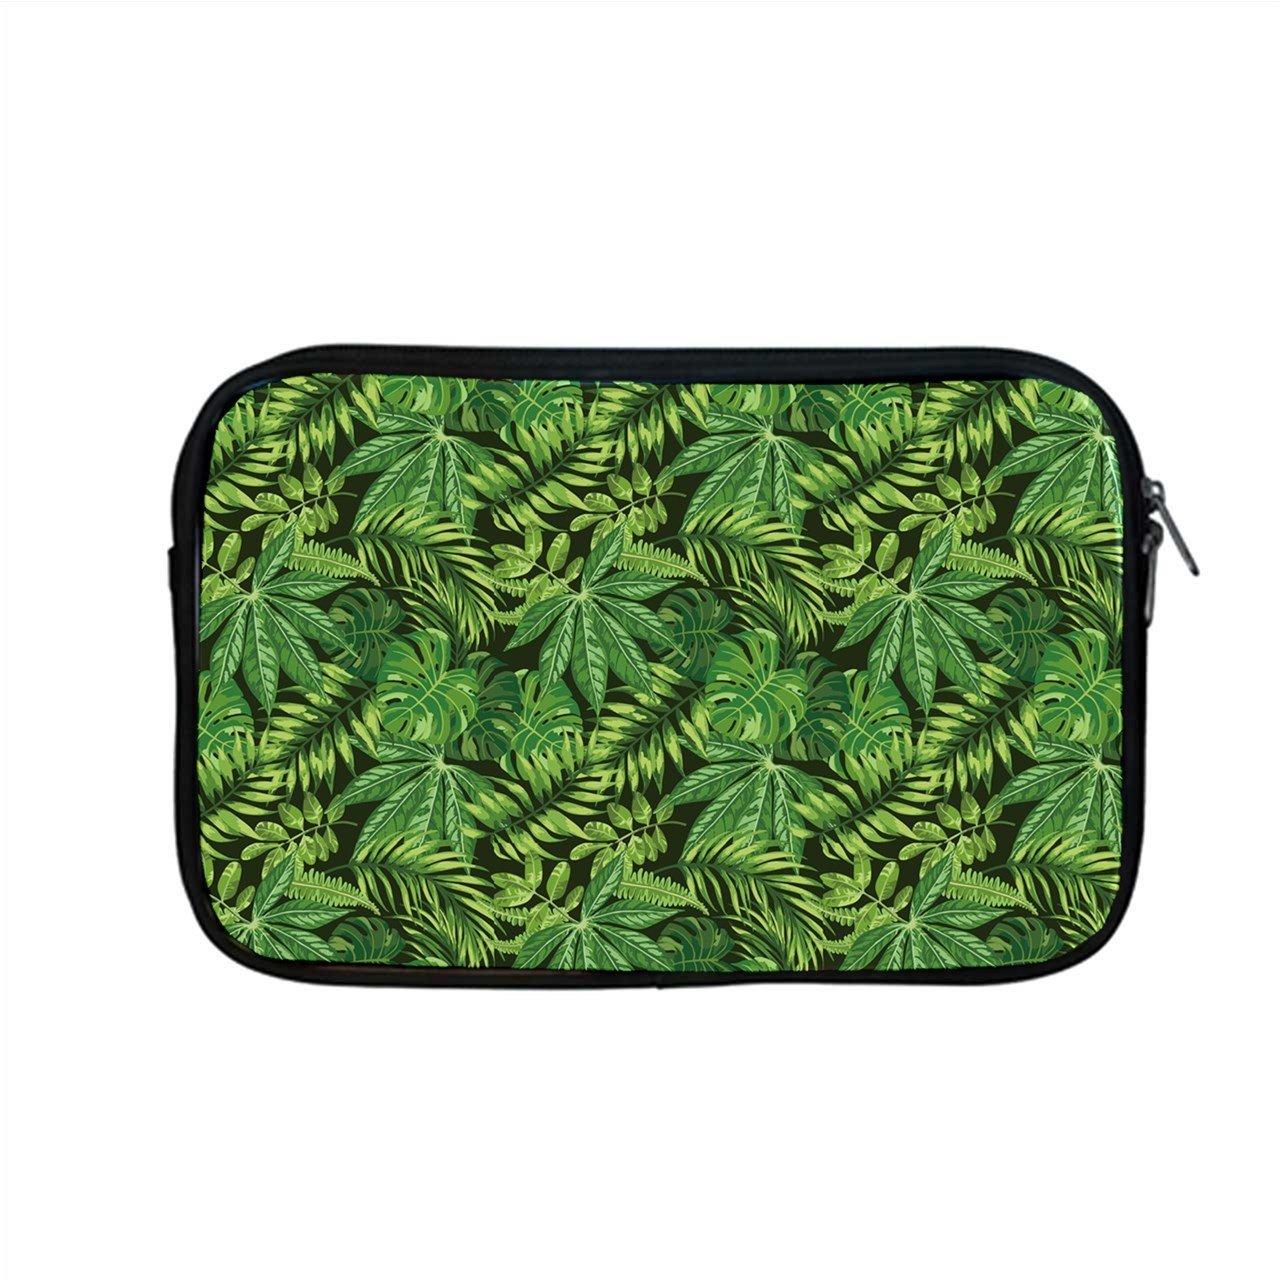 "Tropical Leaves Apple MacBook Pro 13"" Zipper Case"